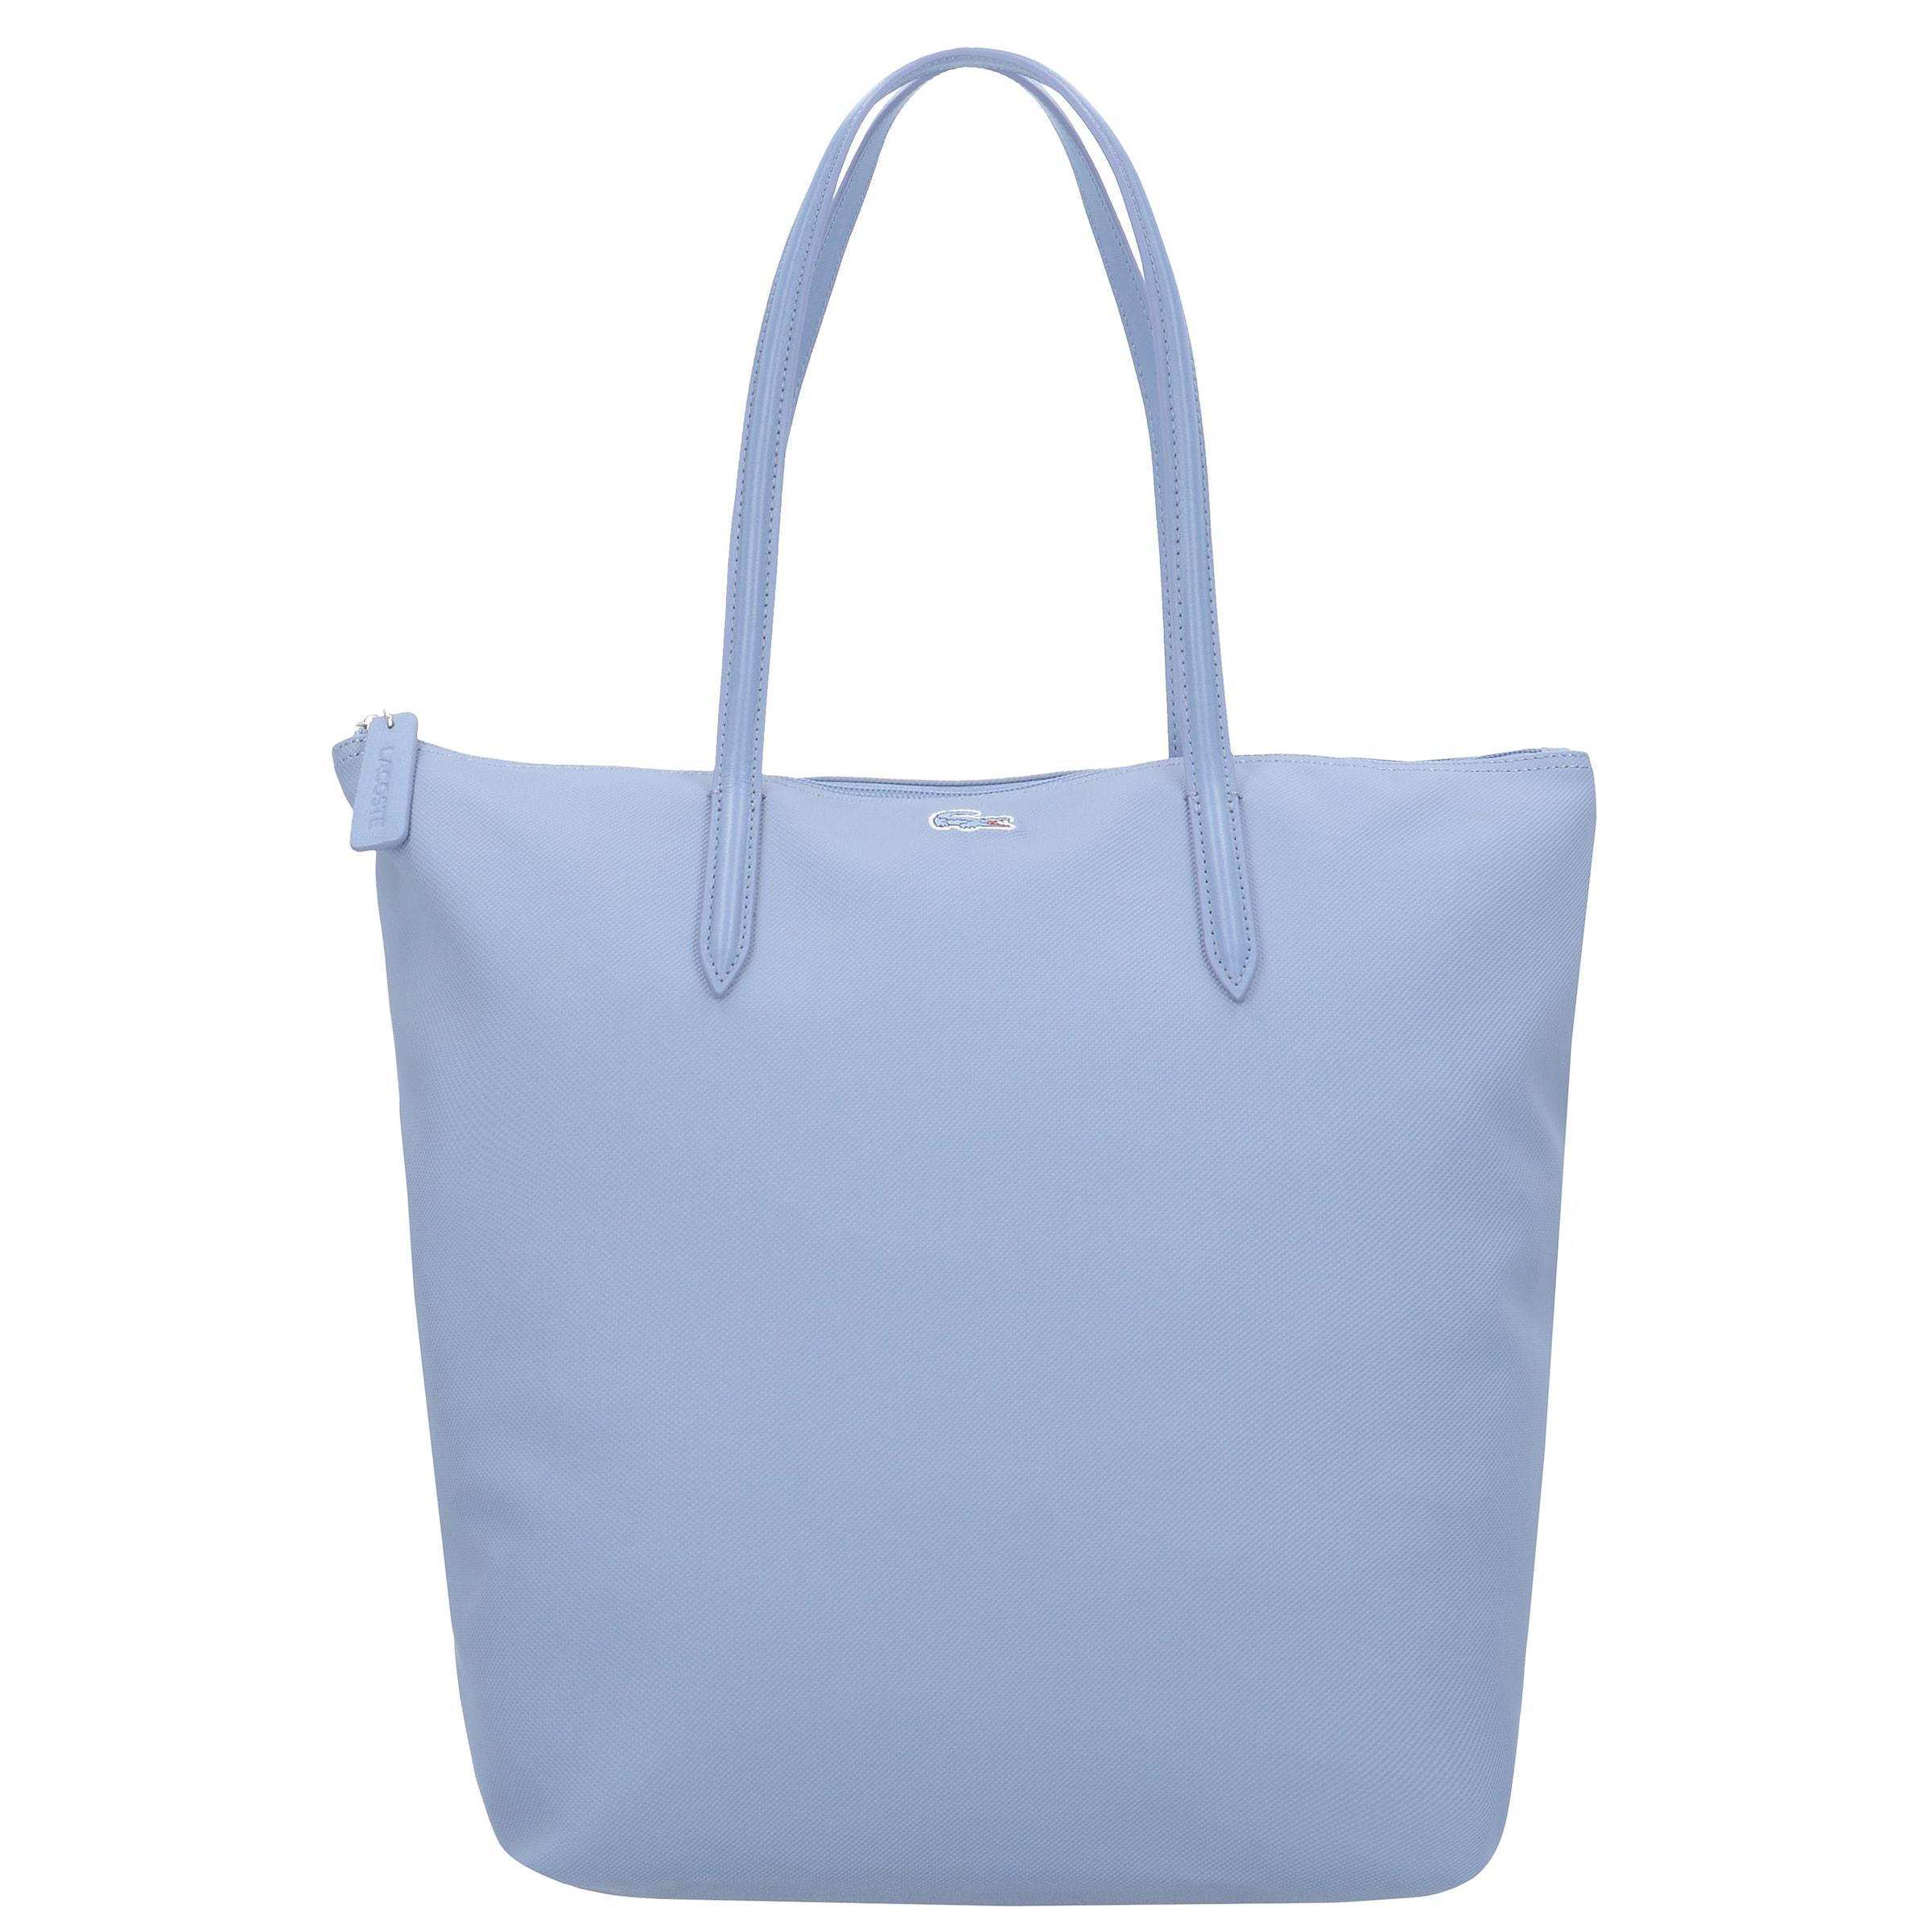 LACOSTE Shopper Tasche Shop Online-Verkauf izR9rdjqS7